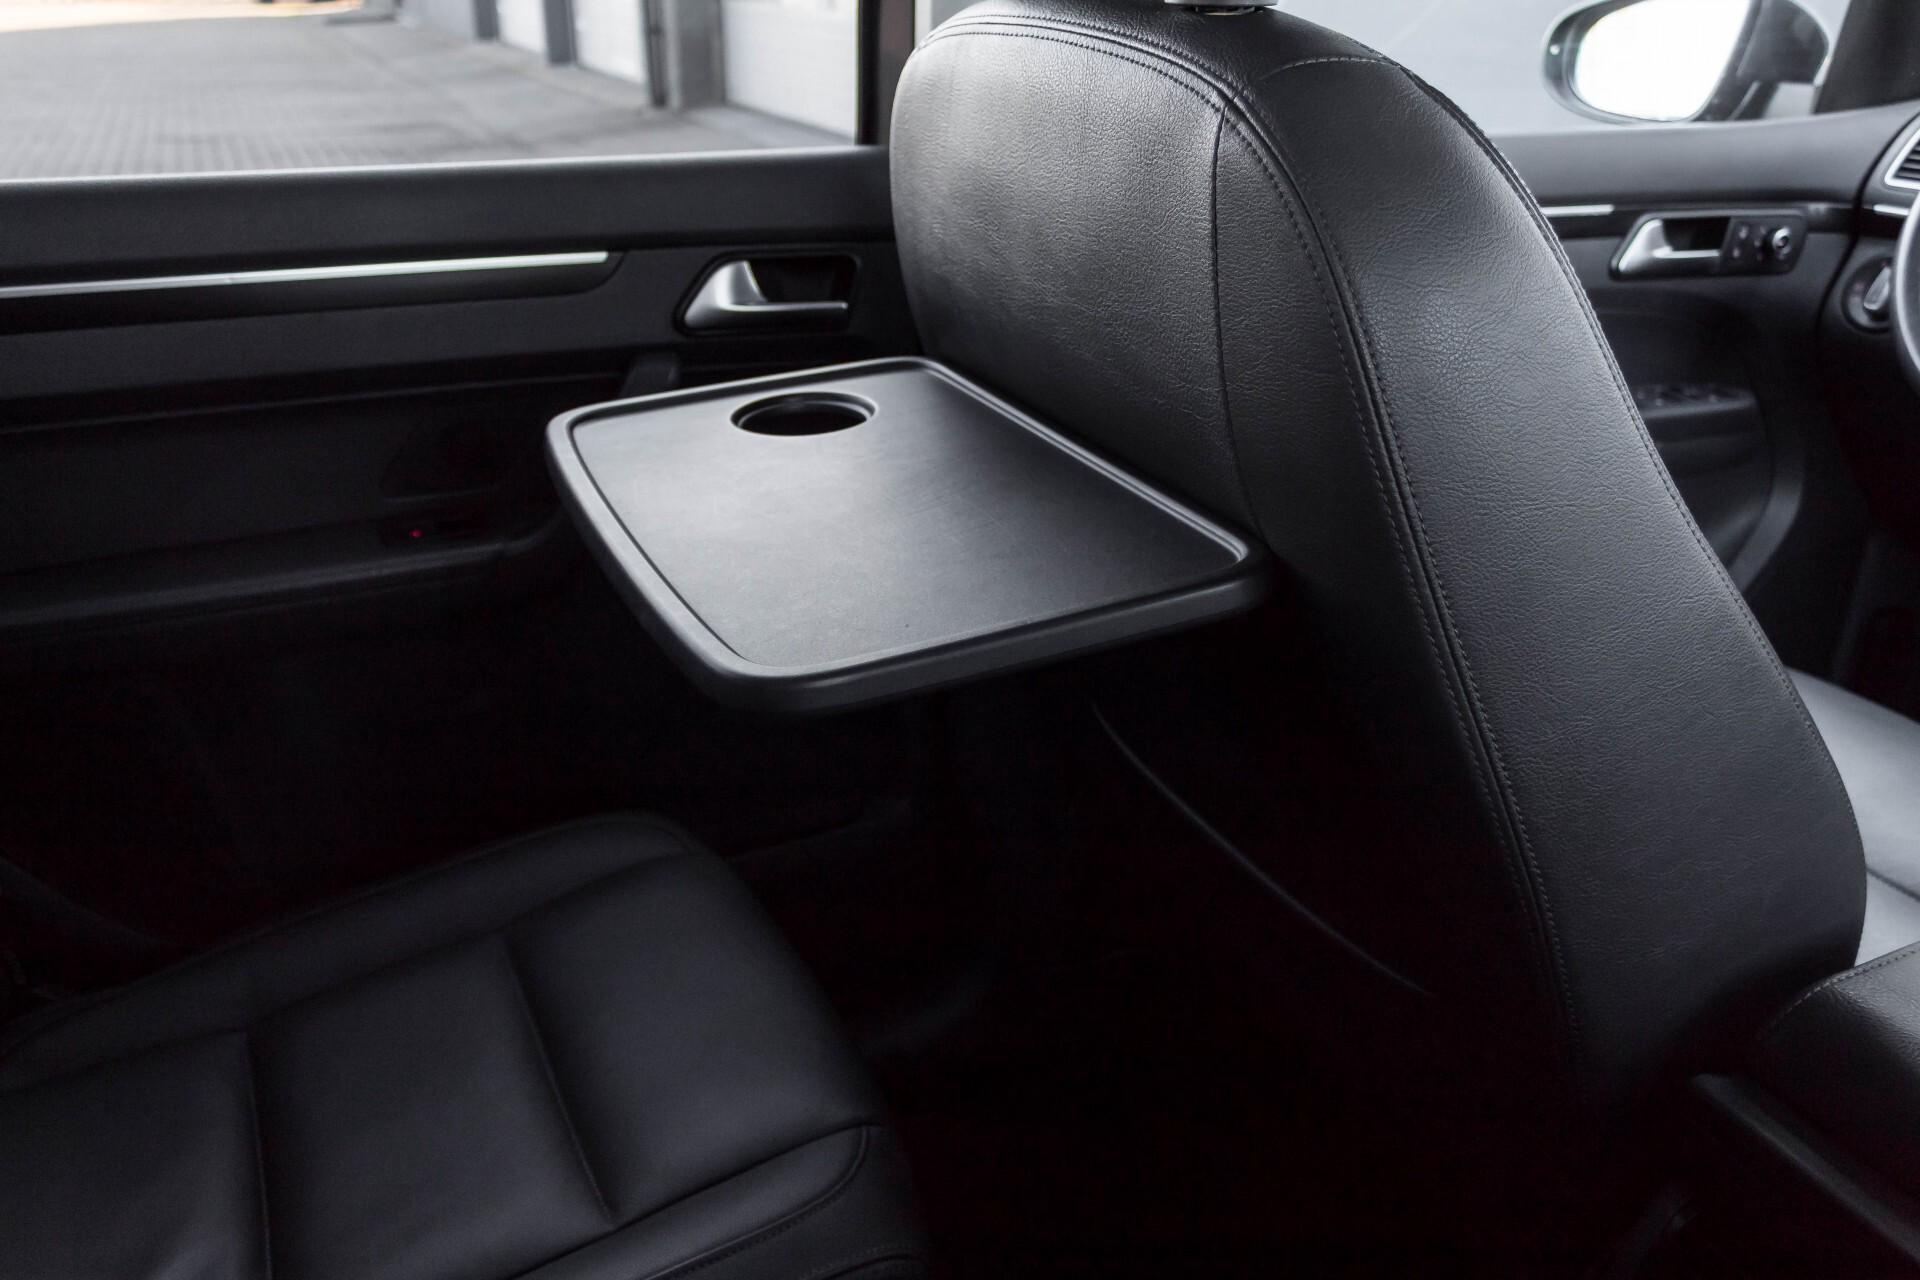 Volkswagen Touran 2.0 TDI Highline 7Persoons 177pk Panorama/Leder/Navi/Camera/Verw-Stln/Trhk/ECC/Xenon Aut Foto 37